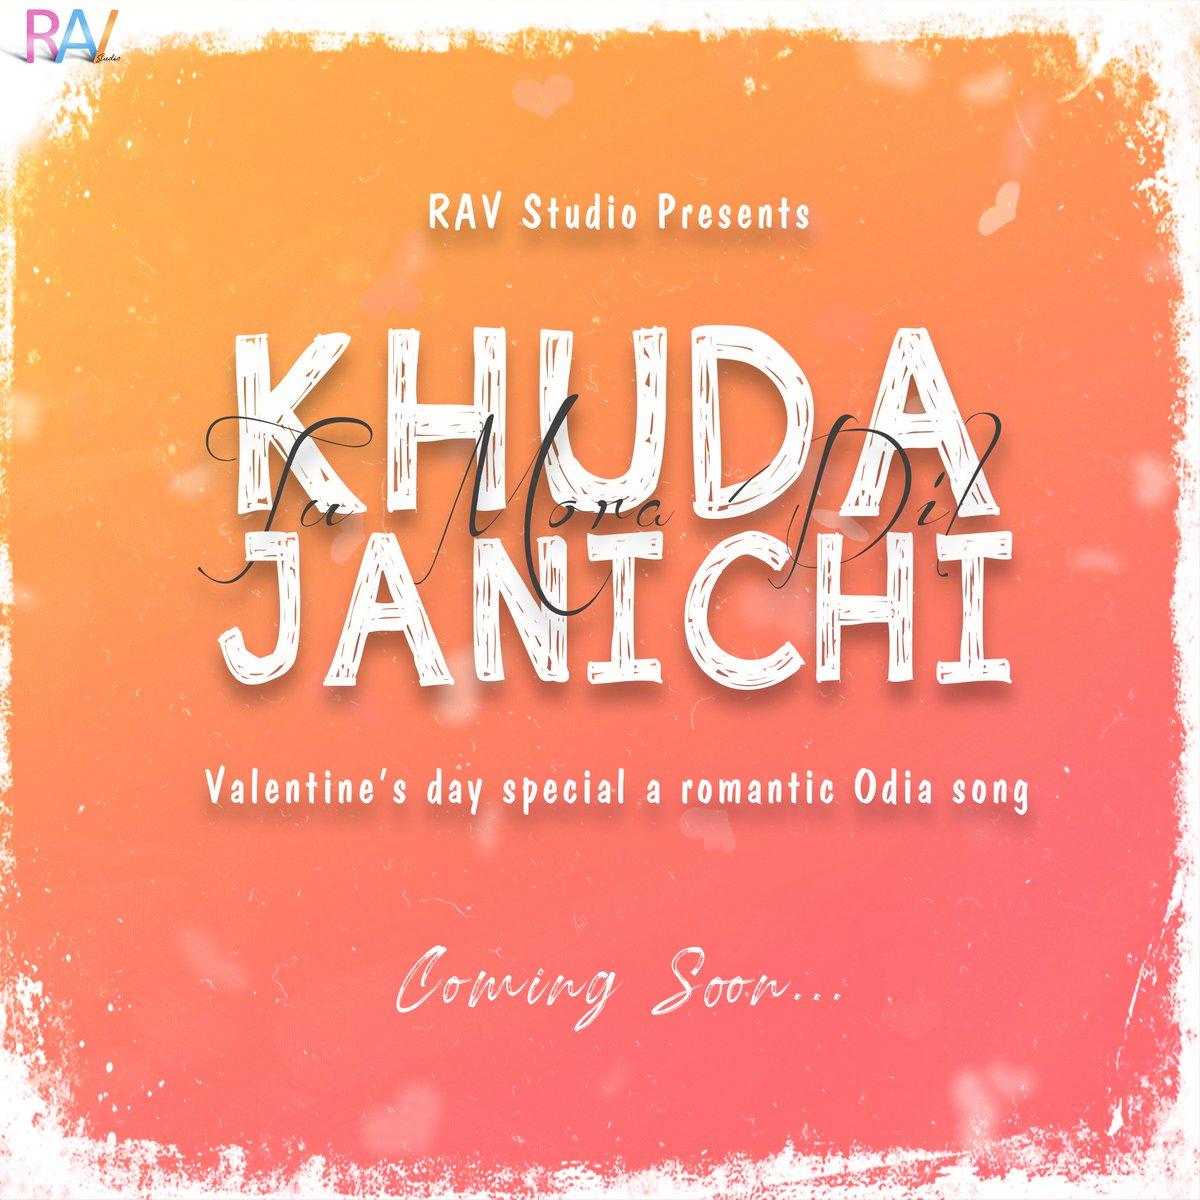 #ravstudio #odiasong #romanticsong #ValentinesDay2020 #YouTube #newsong #khudajanichi #love #ComingSoon #followpic.twitter.com/87iAnYP2Zs